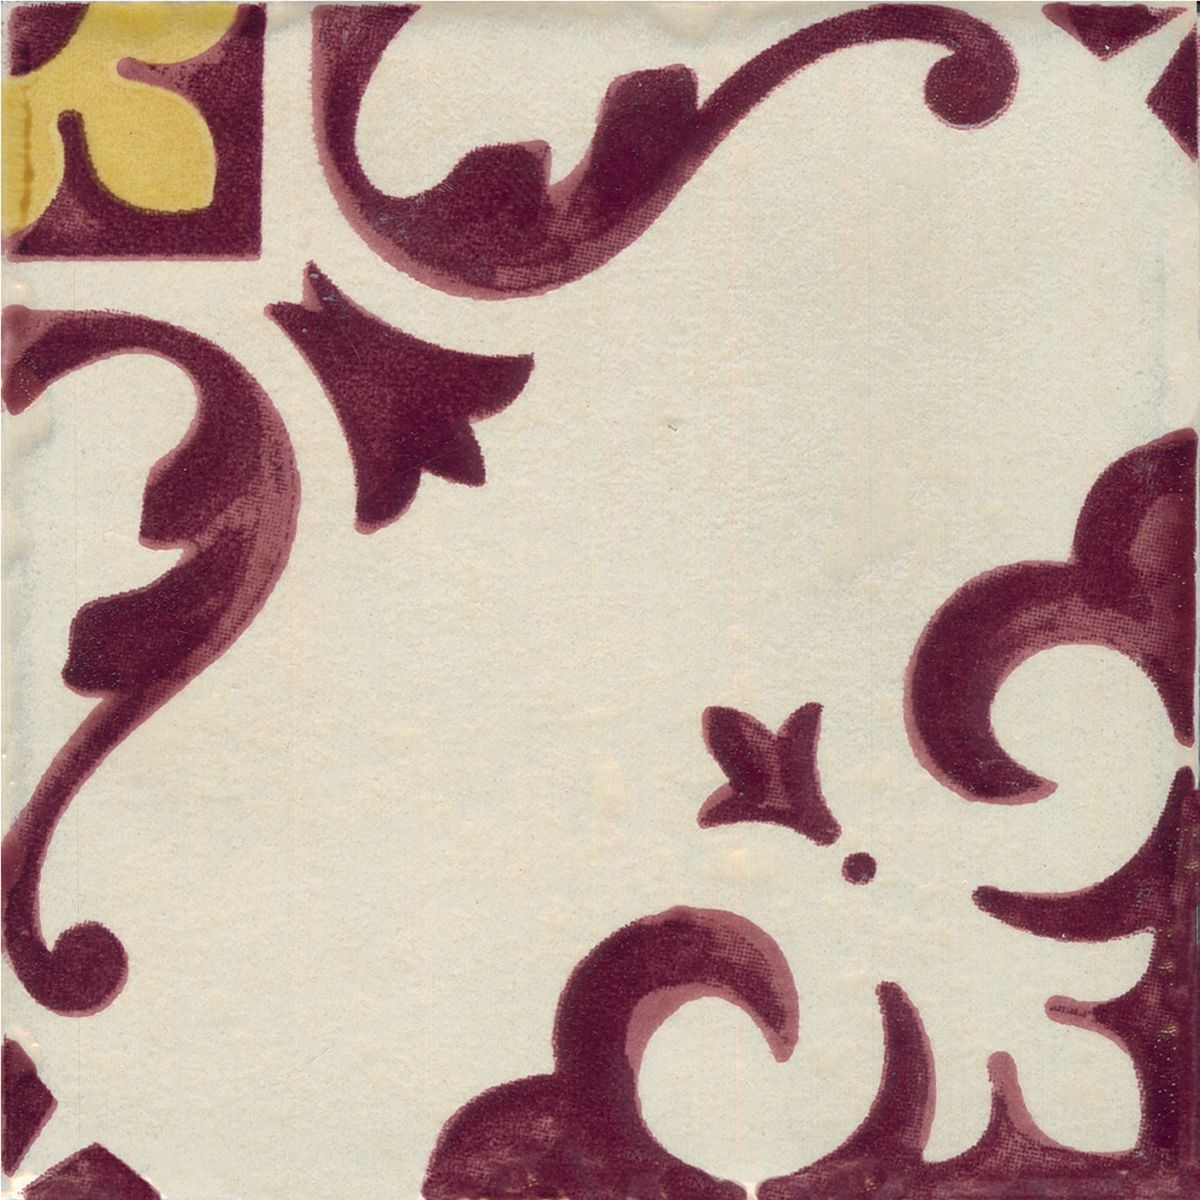 piastrelle bagno jolie: mosaici pavimenti per interni ... - Piastrelle Bagno Jolie